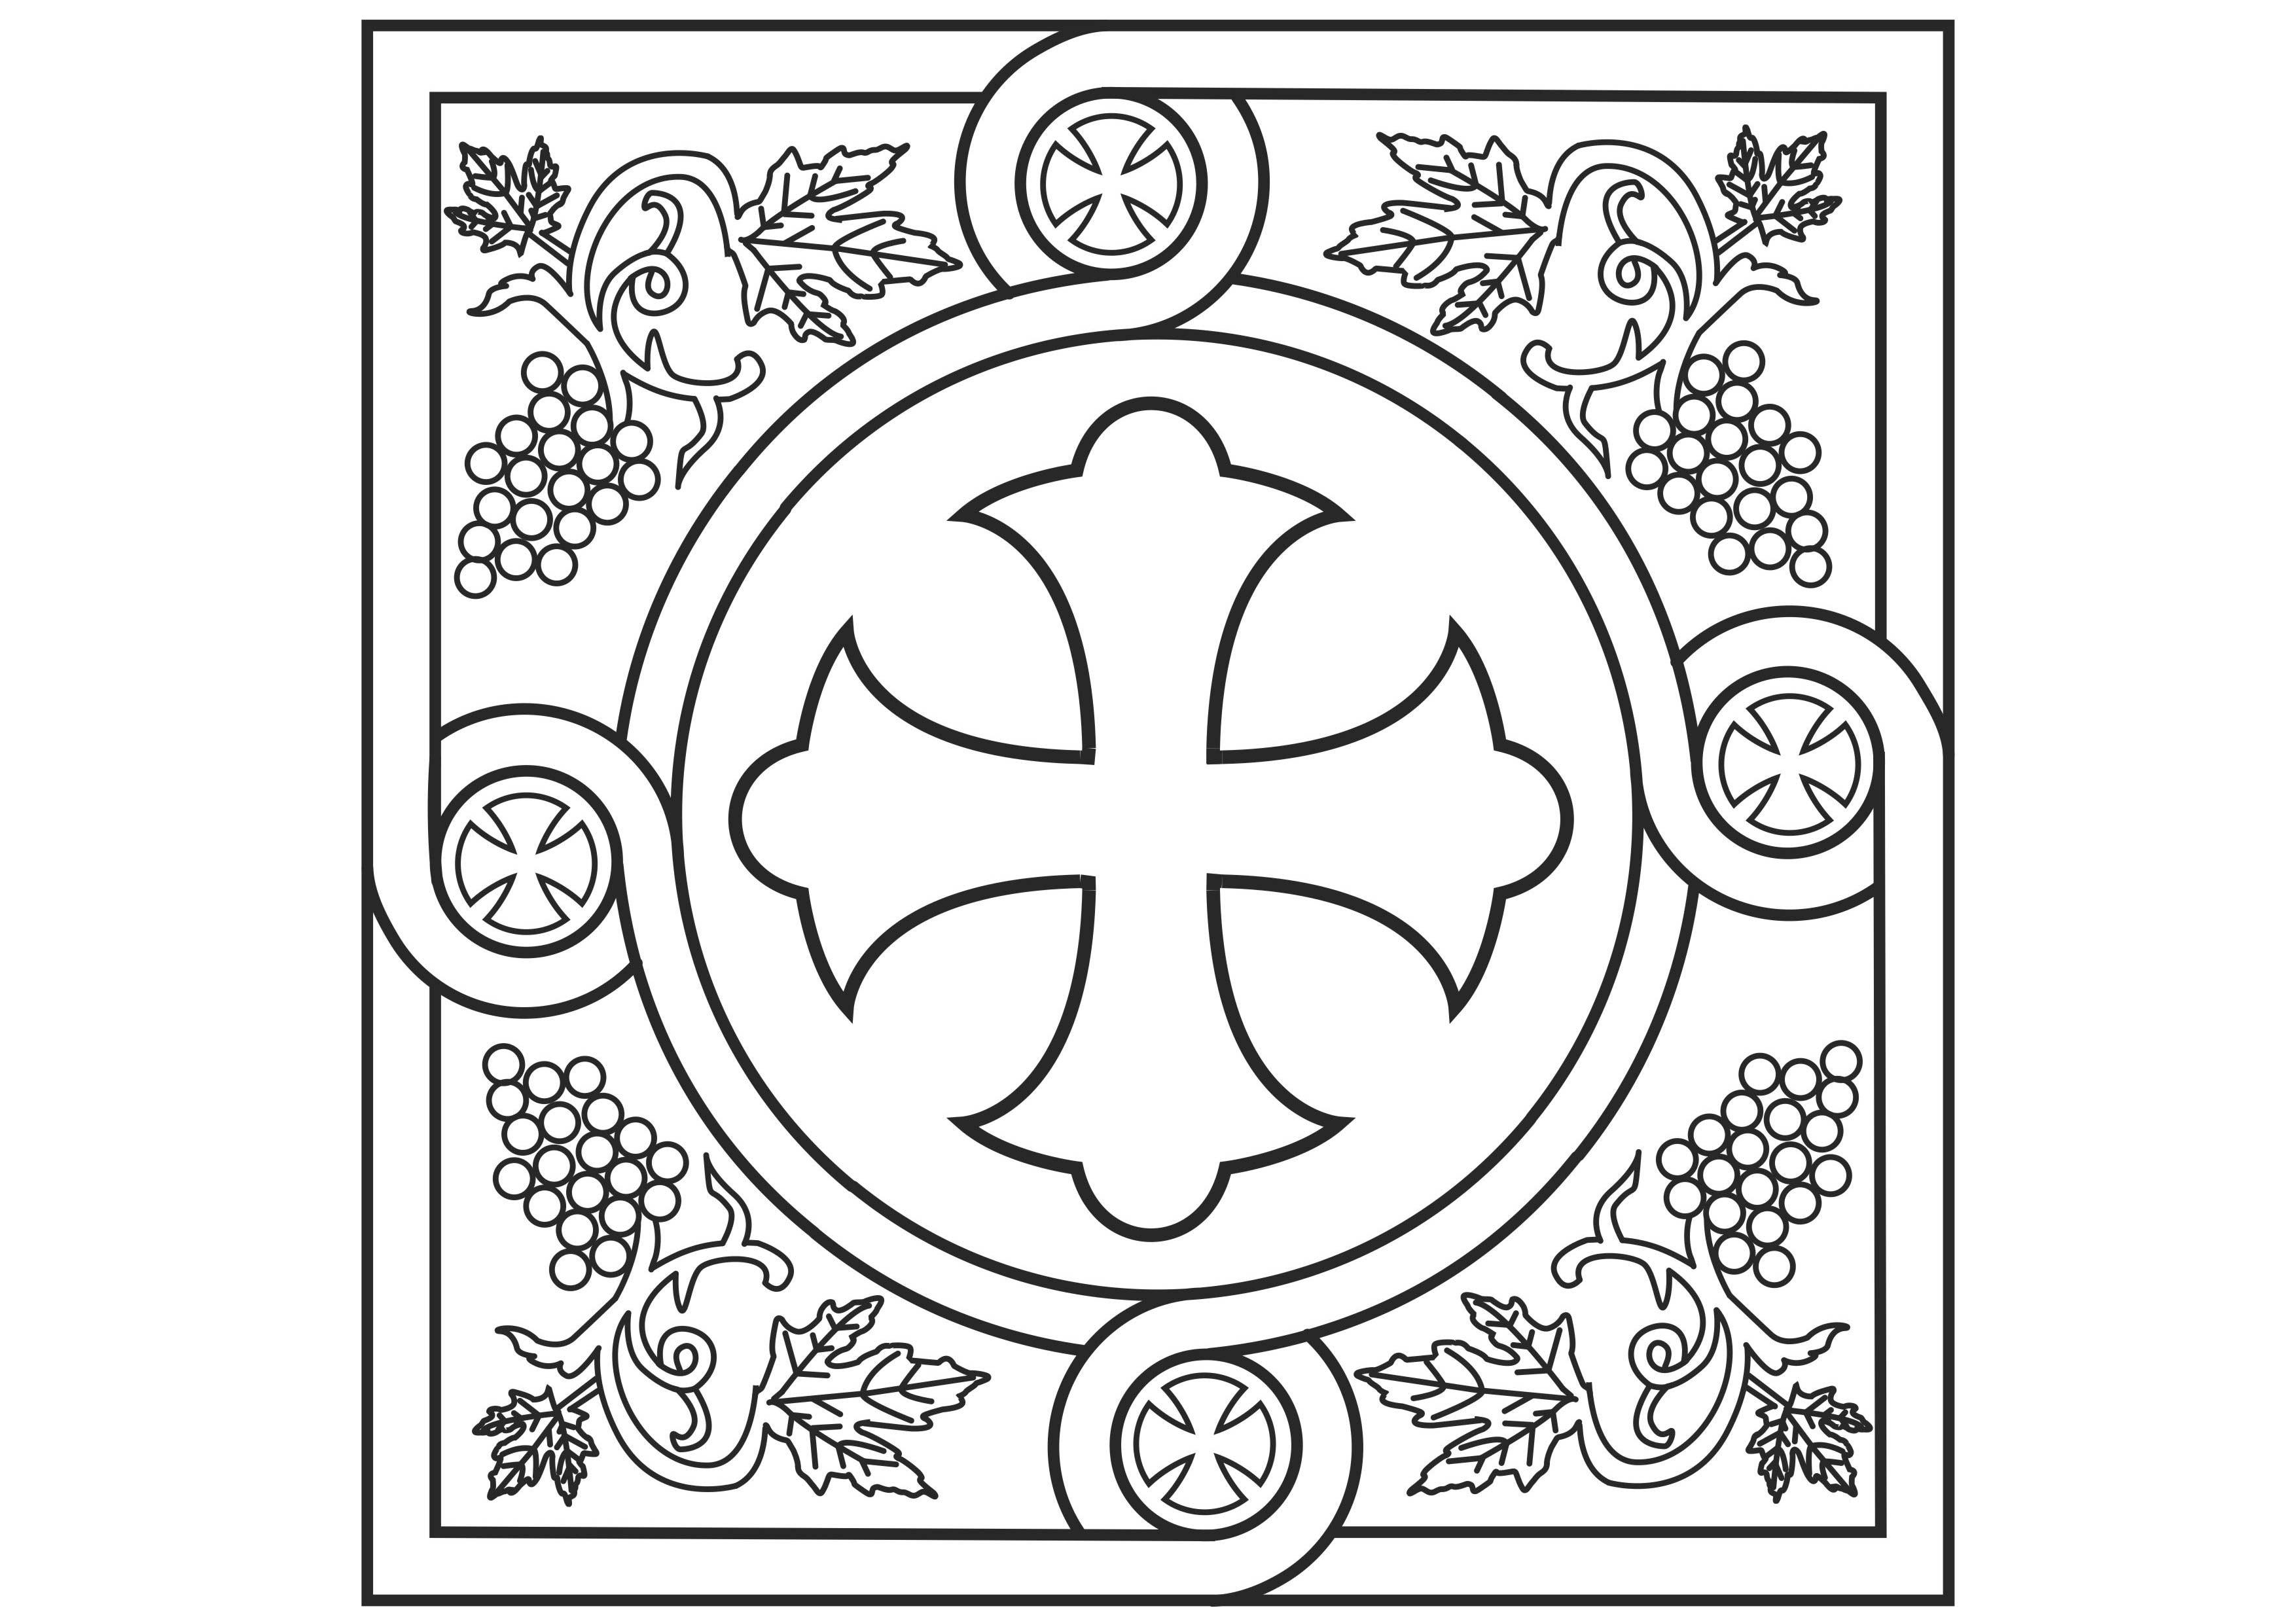 Prayers of the Coptic Orthodox Church